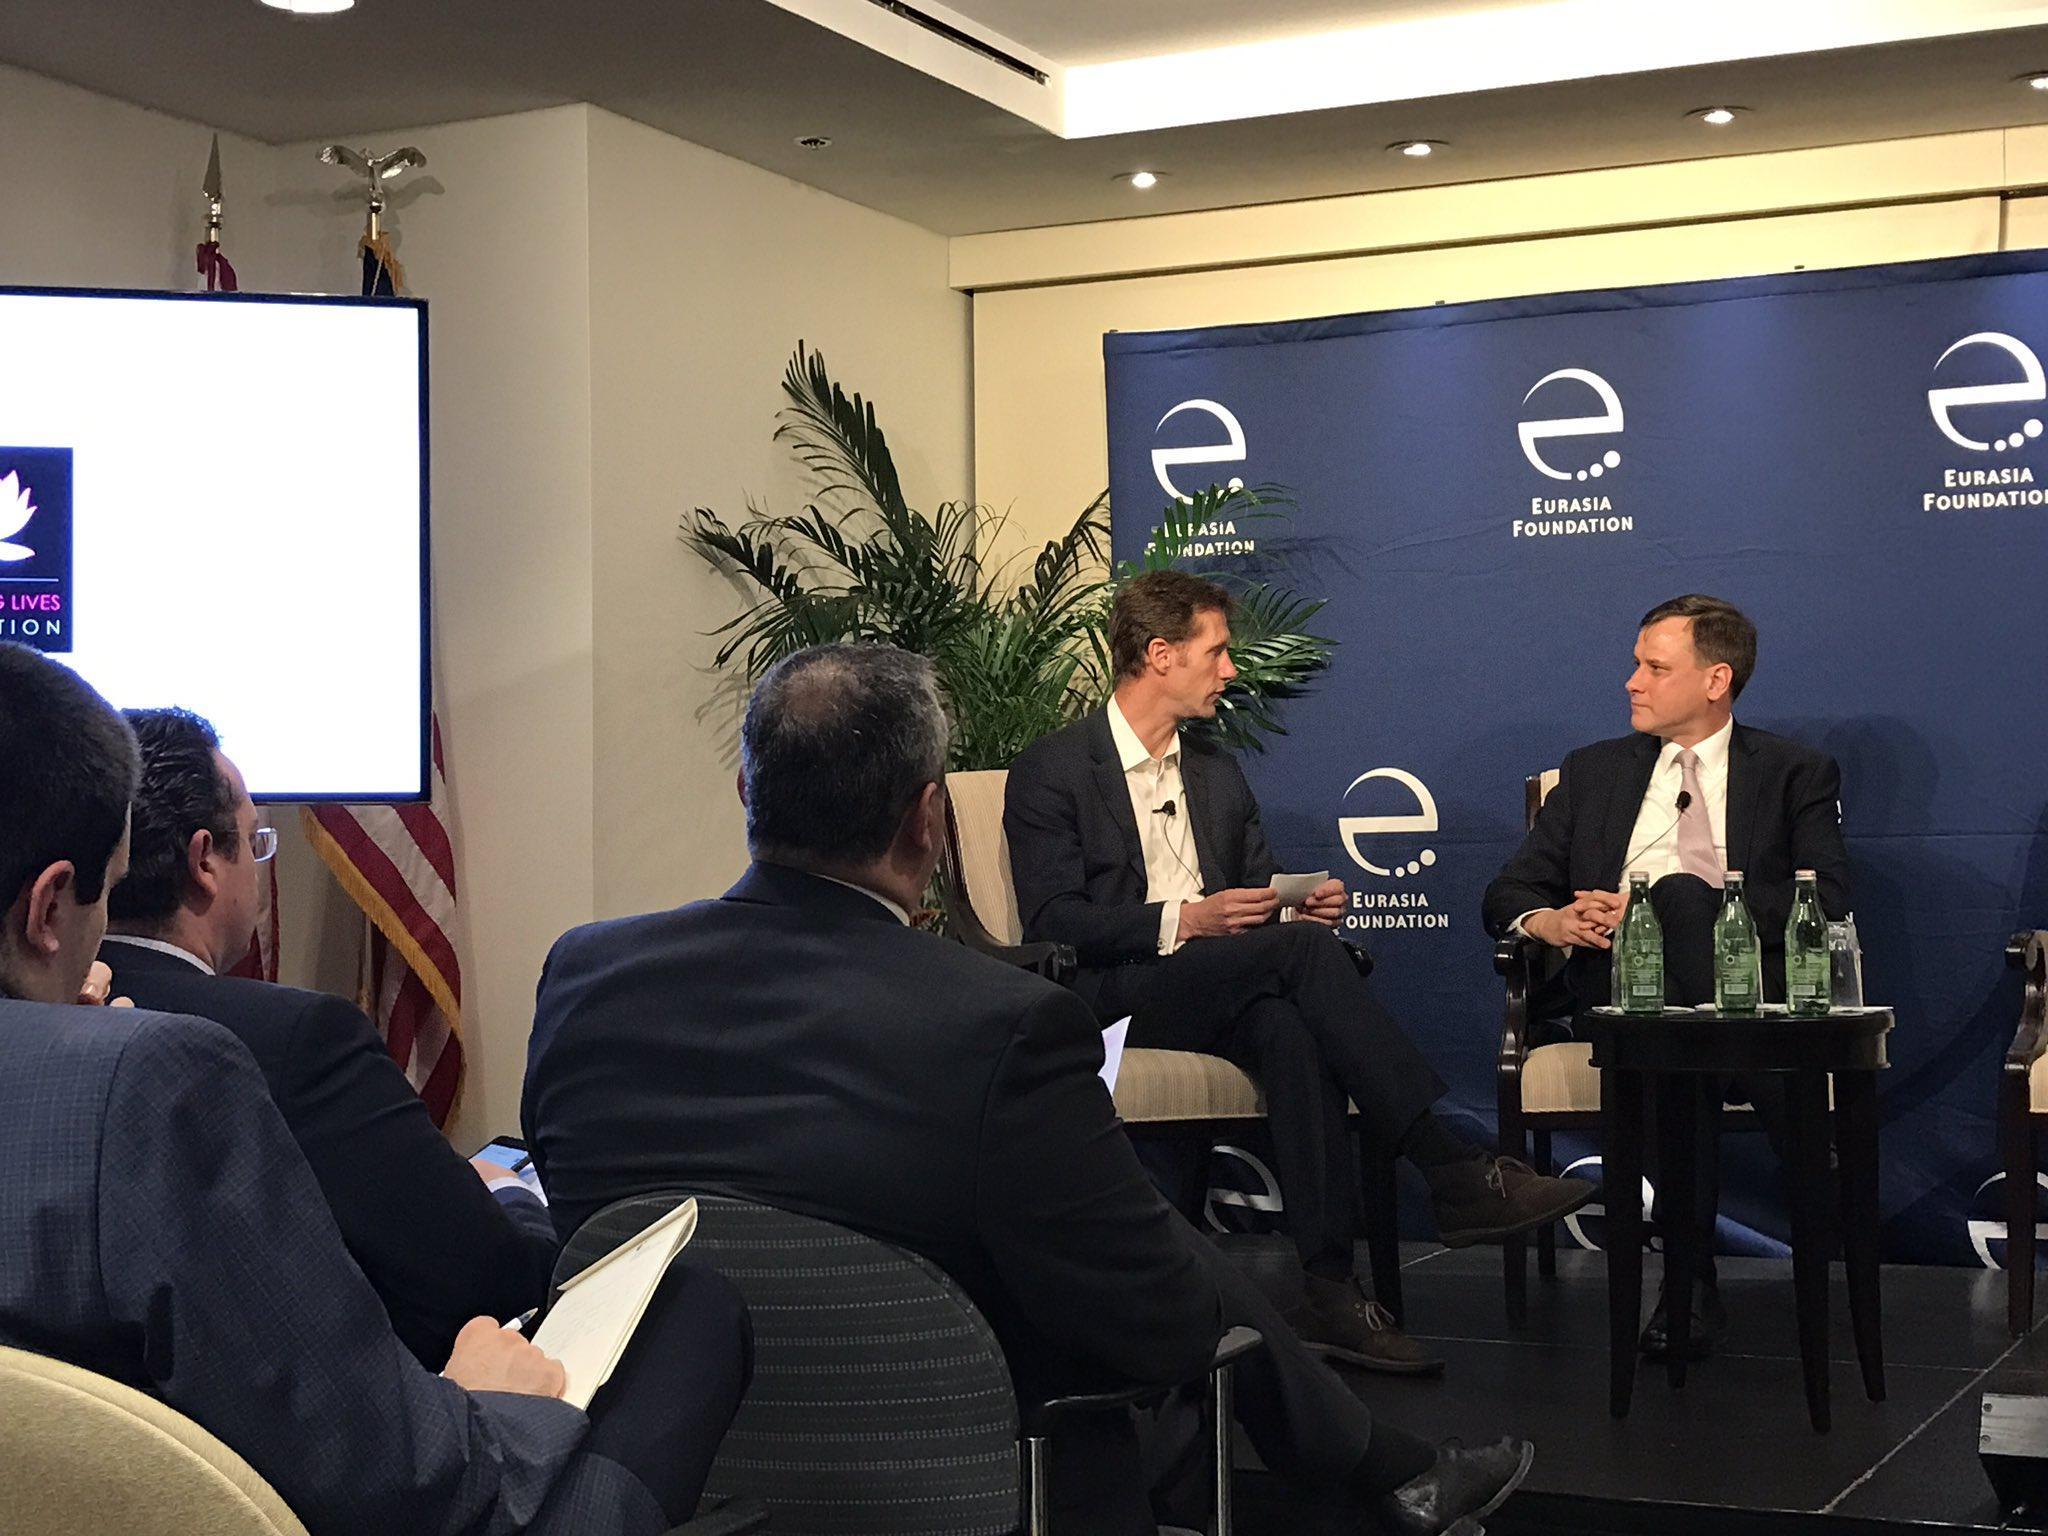 @EFNetwork/John Didiuk: OPEC is using Georgia as a best examp 4 aggressive effort taken 2 impr business env&offer open invest opportunities https://t.co/NgGv6NmPkU